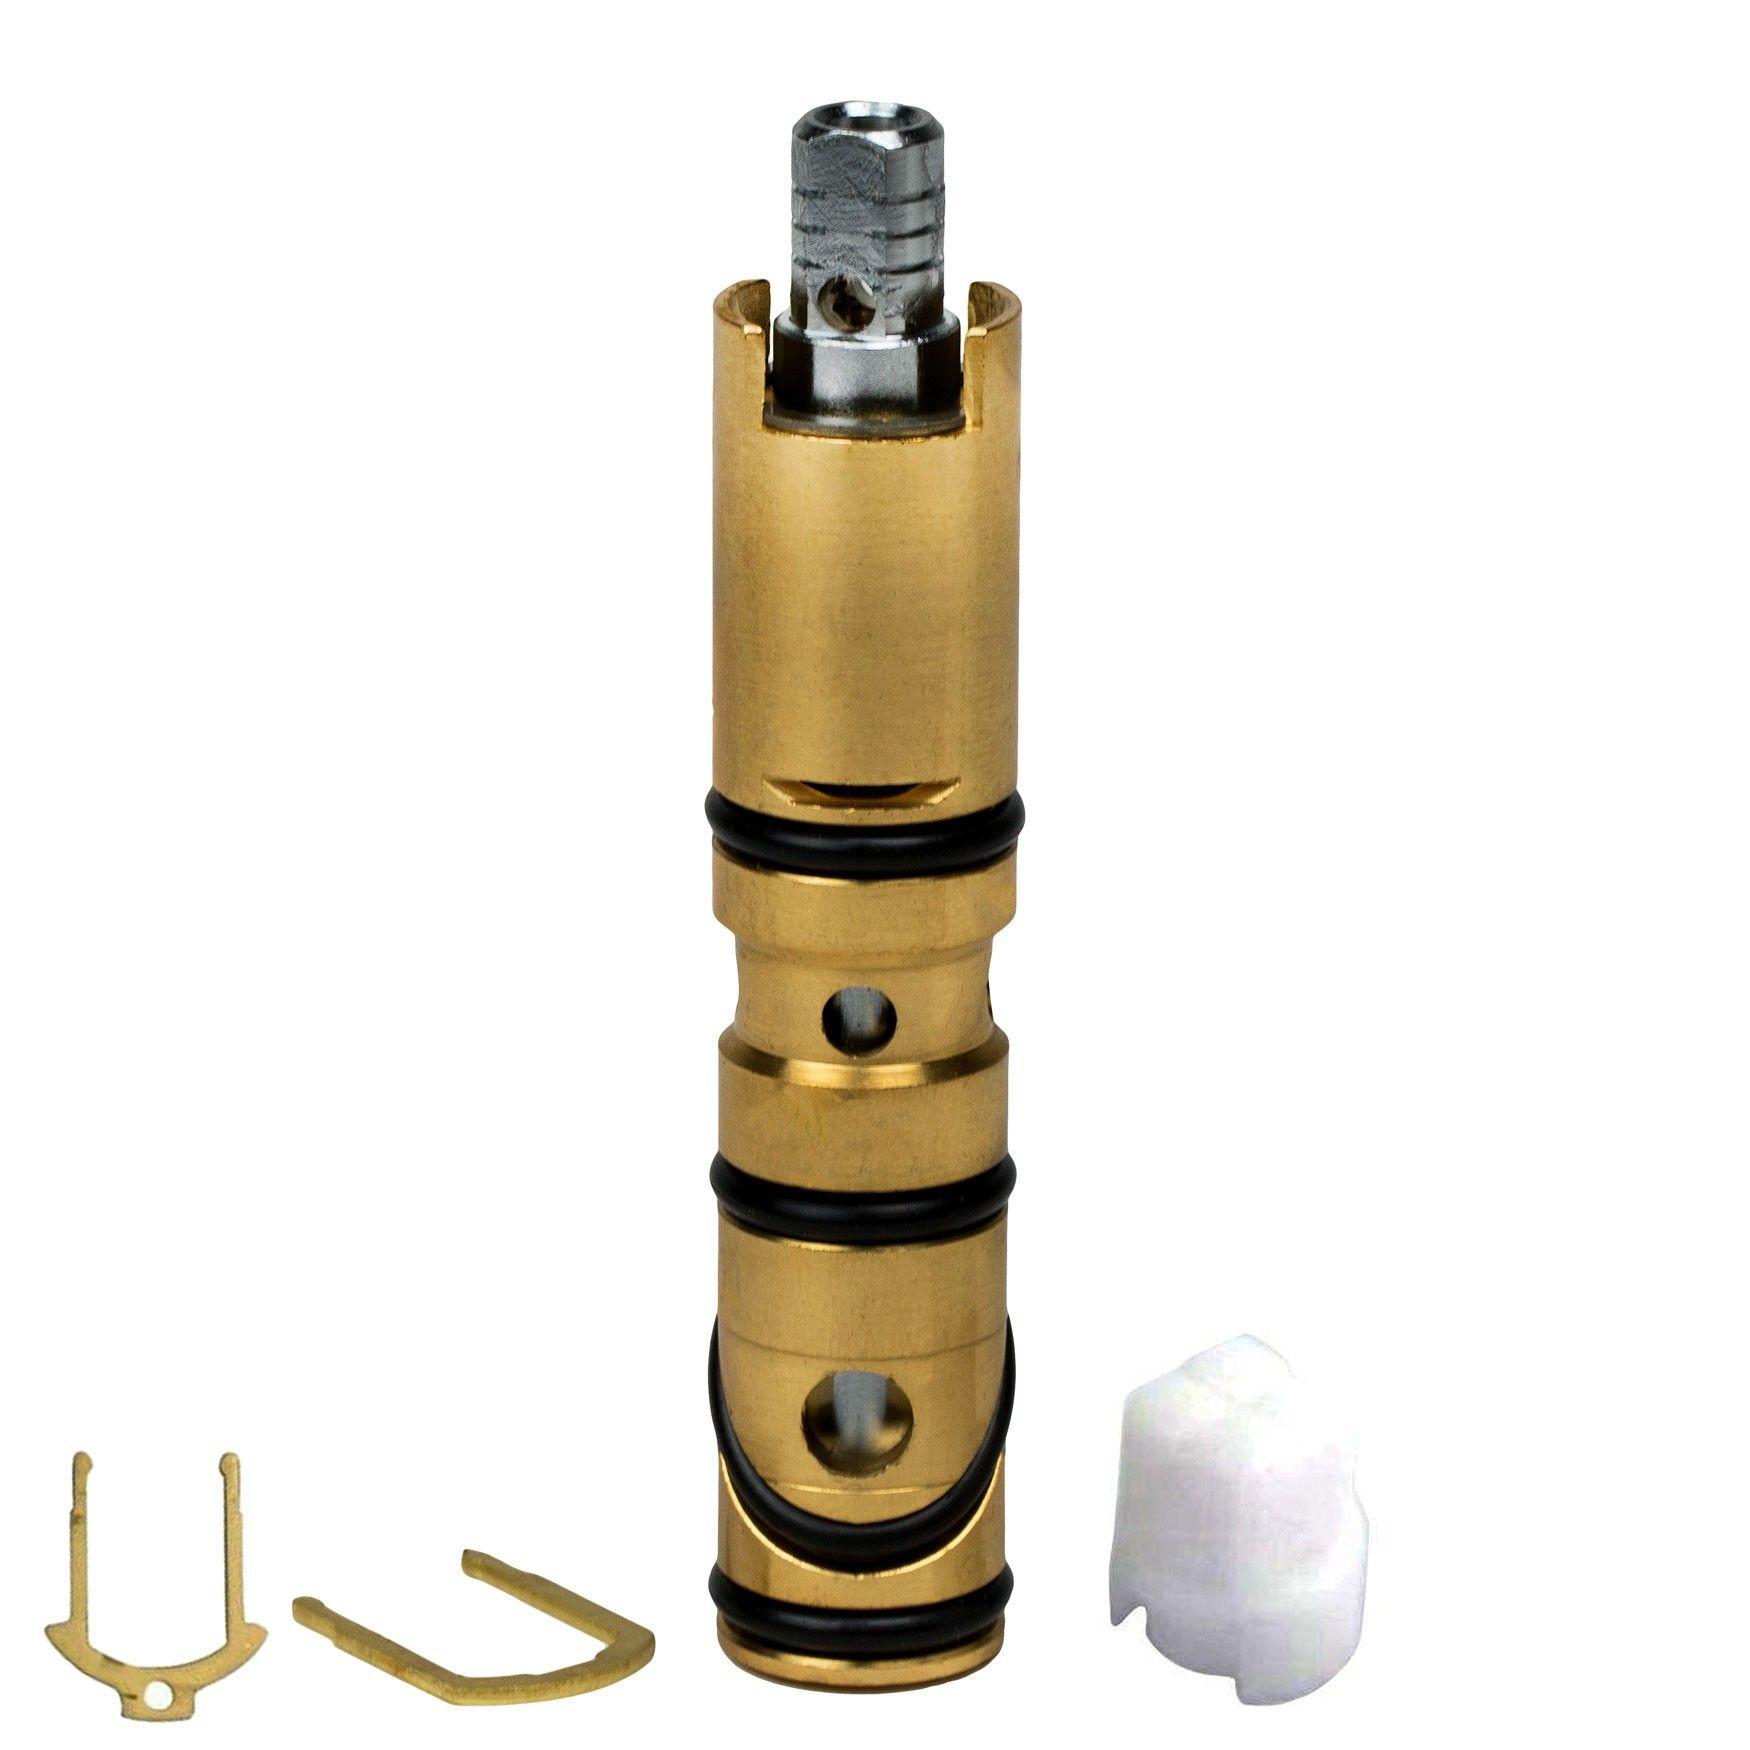 Moen 1200 1200b Stem Cartridge Replacement Kit Moenfaucetparts